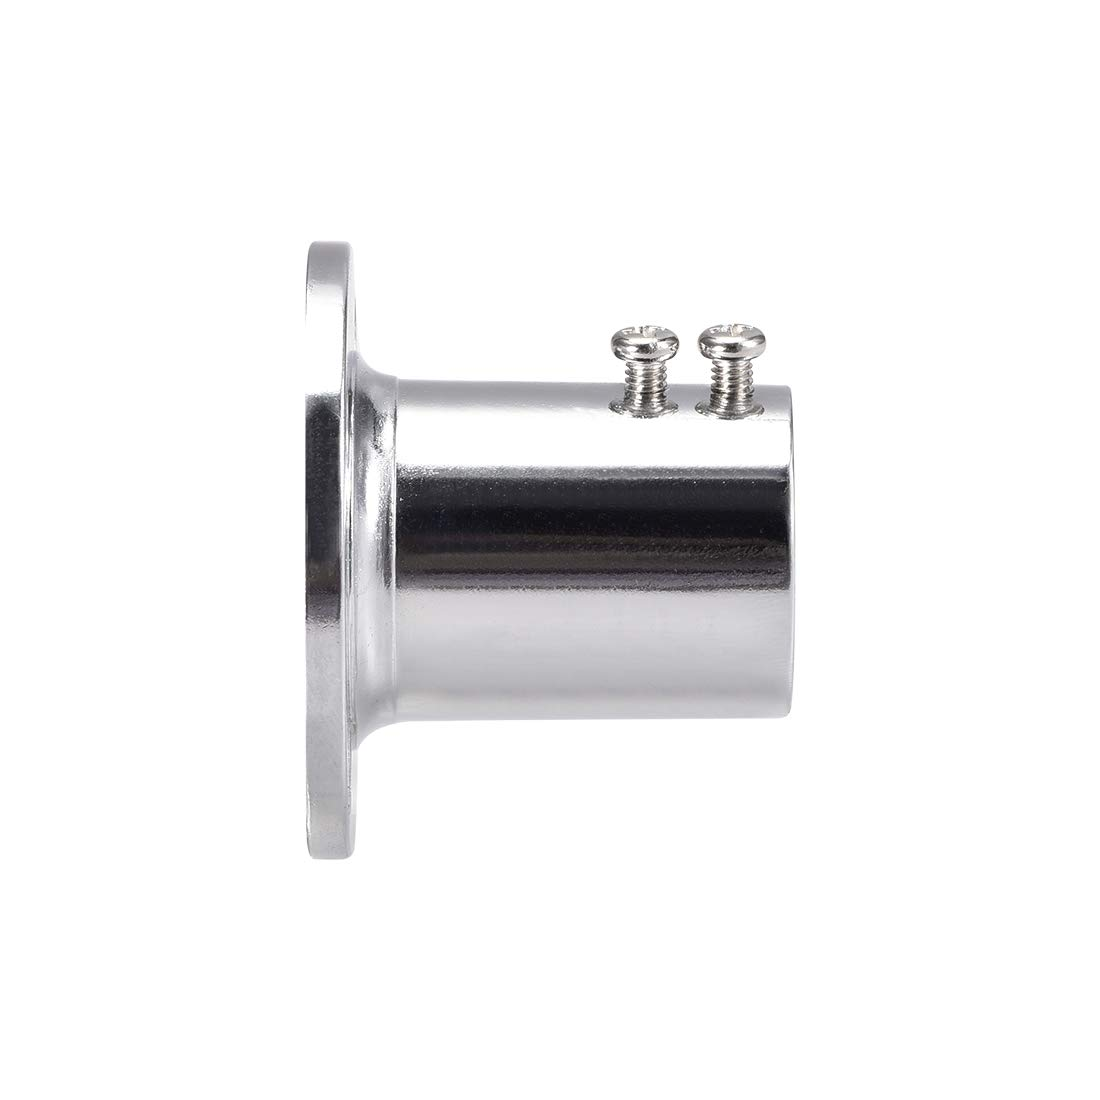 uxcell Closet Wardrobe Rod Flange,25mm//1inch Dia Long Socket Bracket Support Holder for Pipe 2Pcs